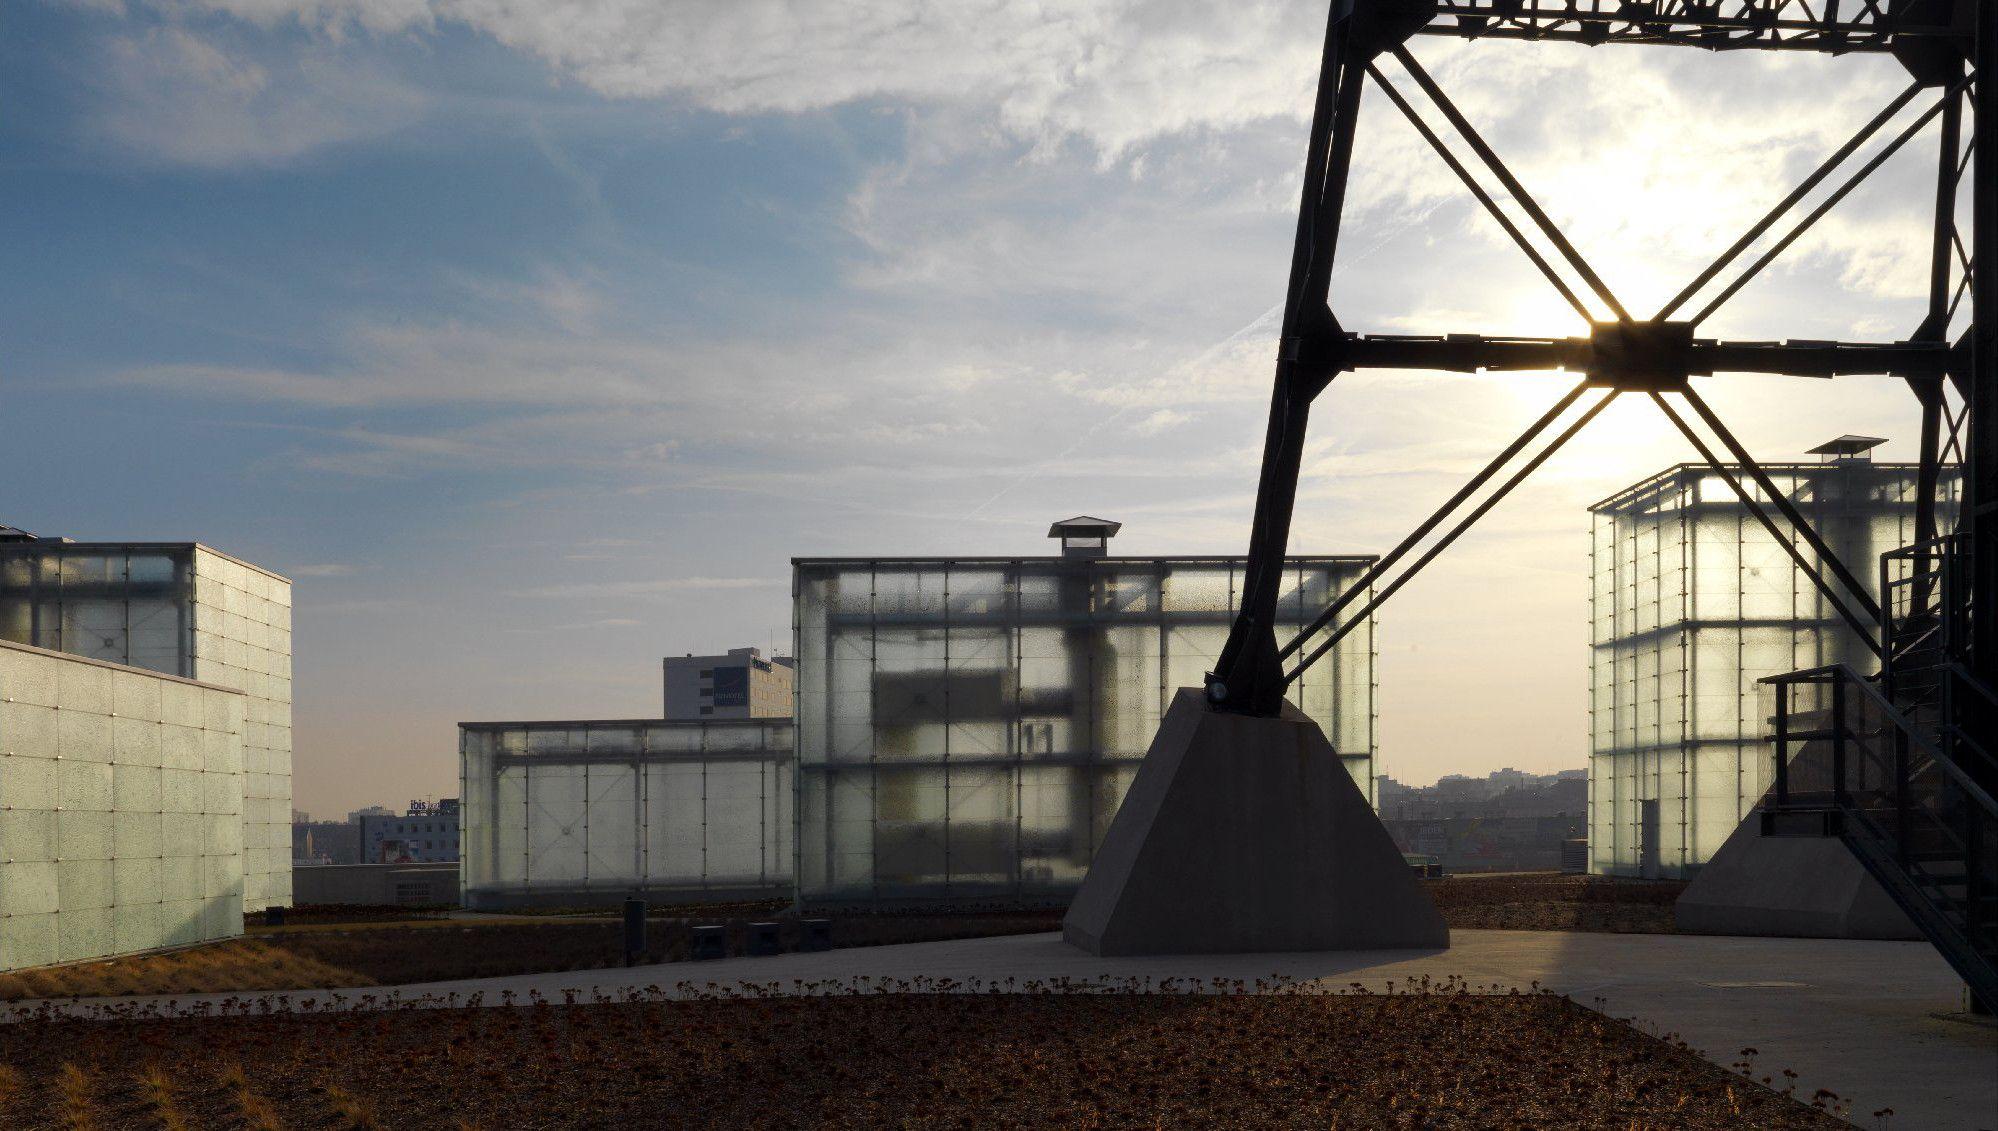 Schlesisches Museum in Katowice - Glas - Kultur - baunetzwissen.de